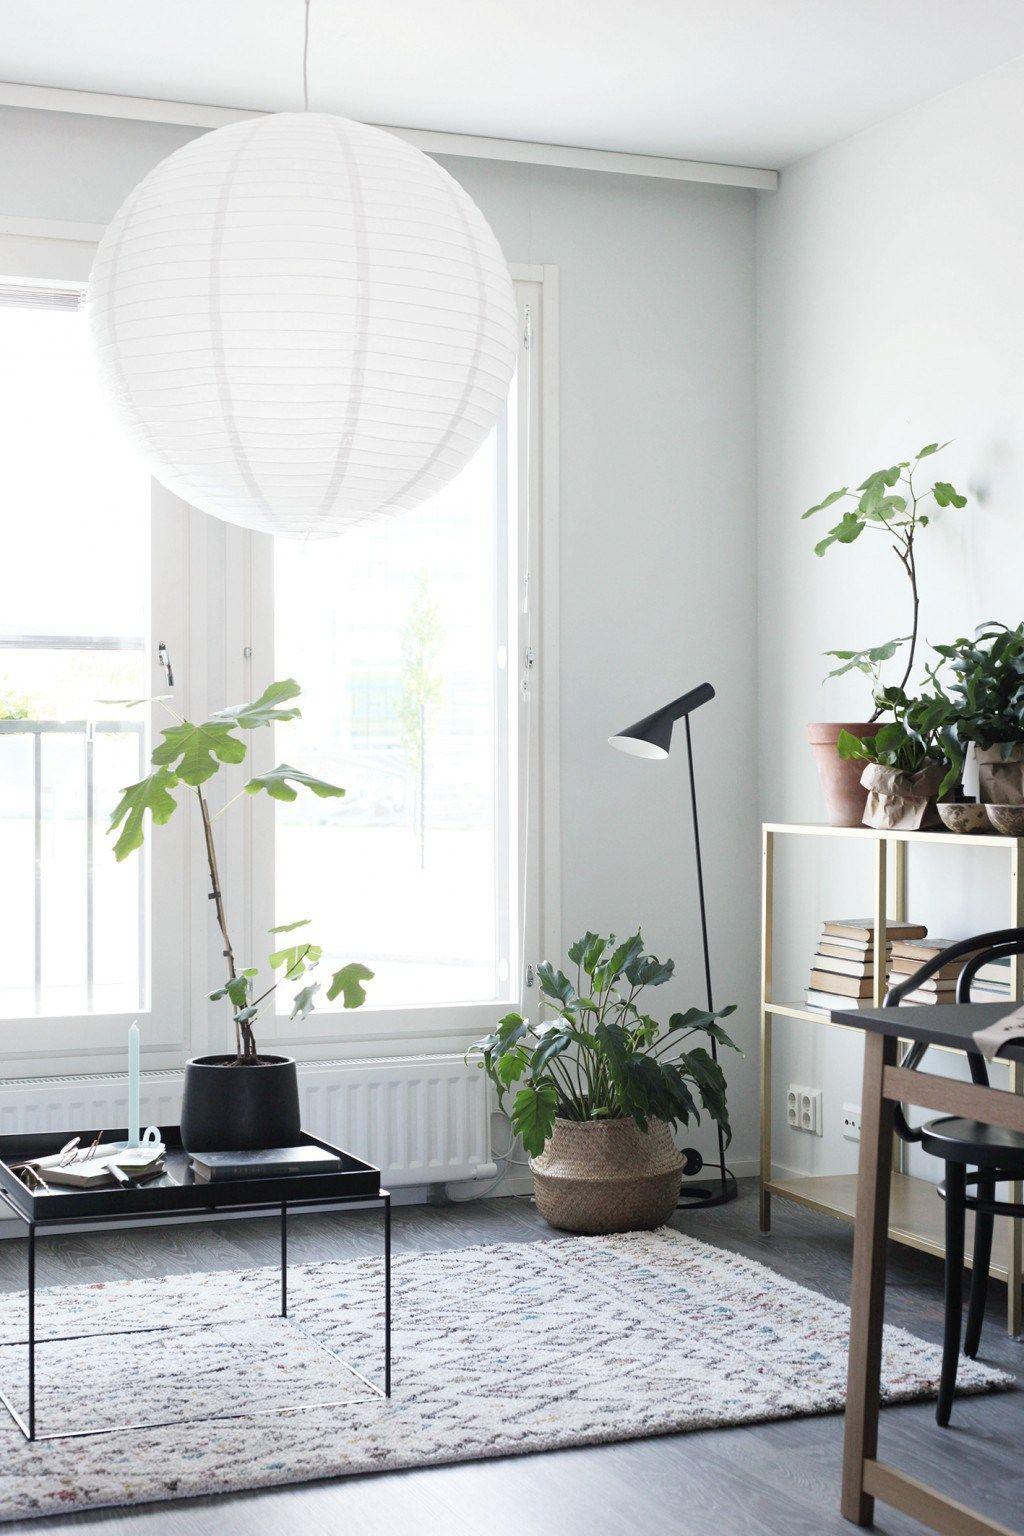 Smart Small Home   COCO LAPINE DESIGN. Apartment InteriorRoom  InteriorInterior PlantsApartment IdeasInterior LightingLiving ...